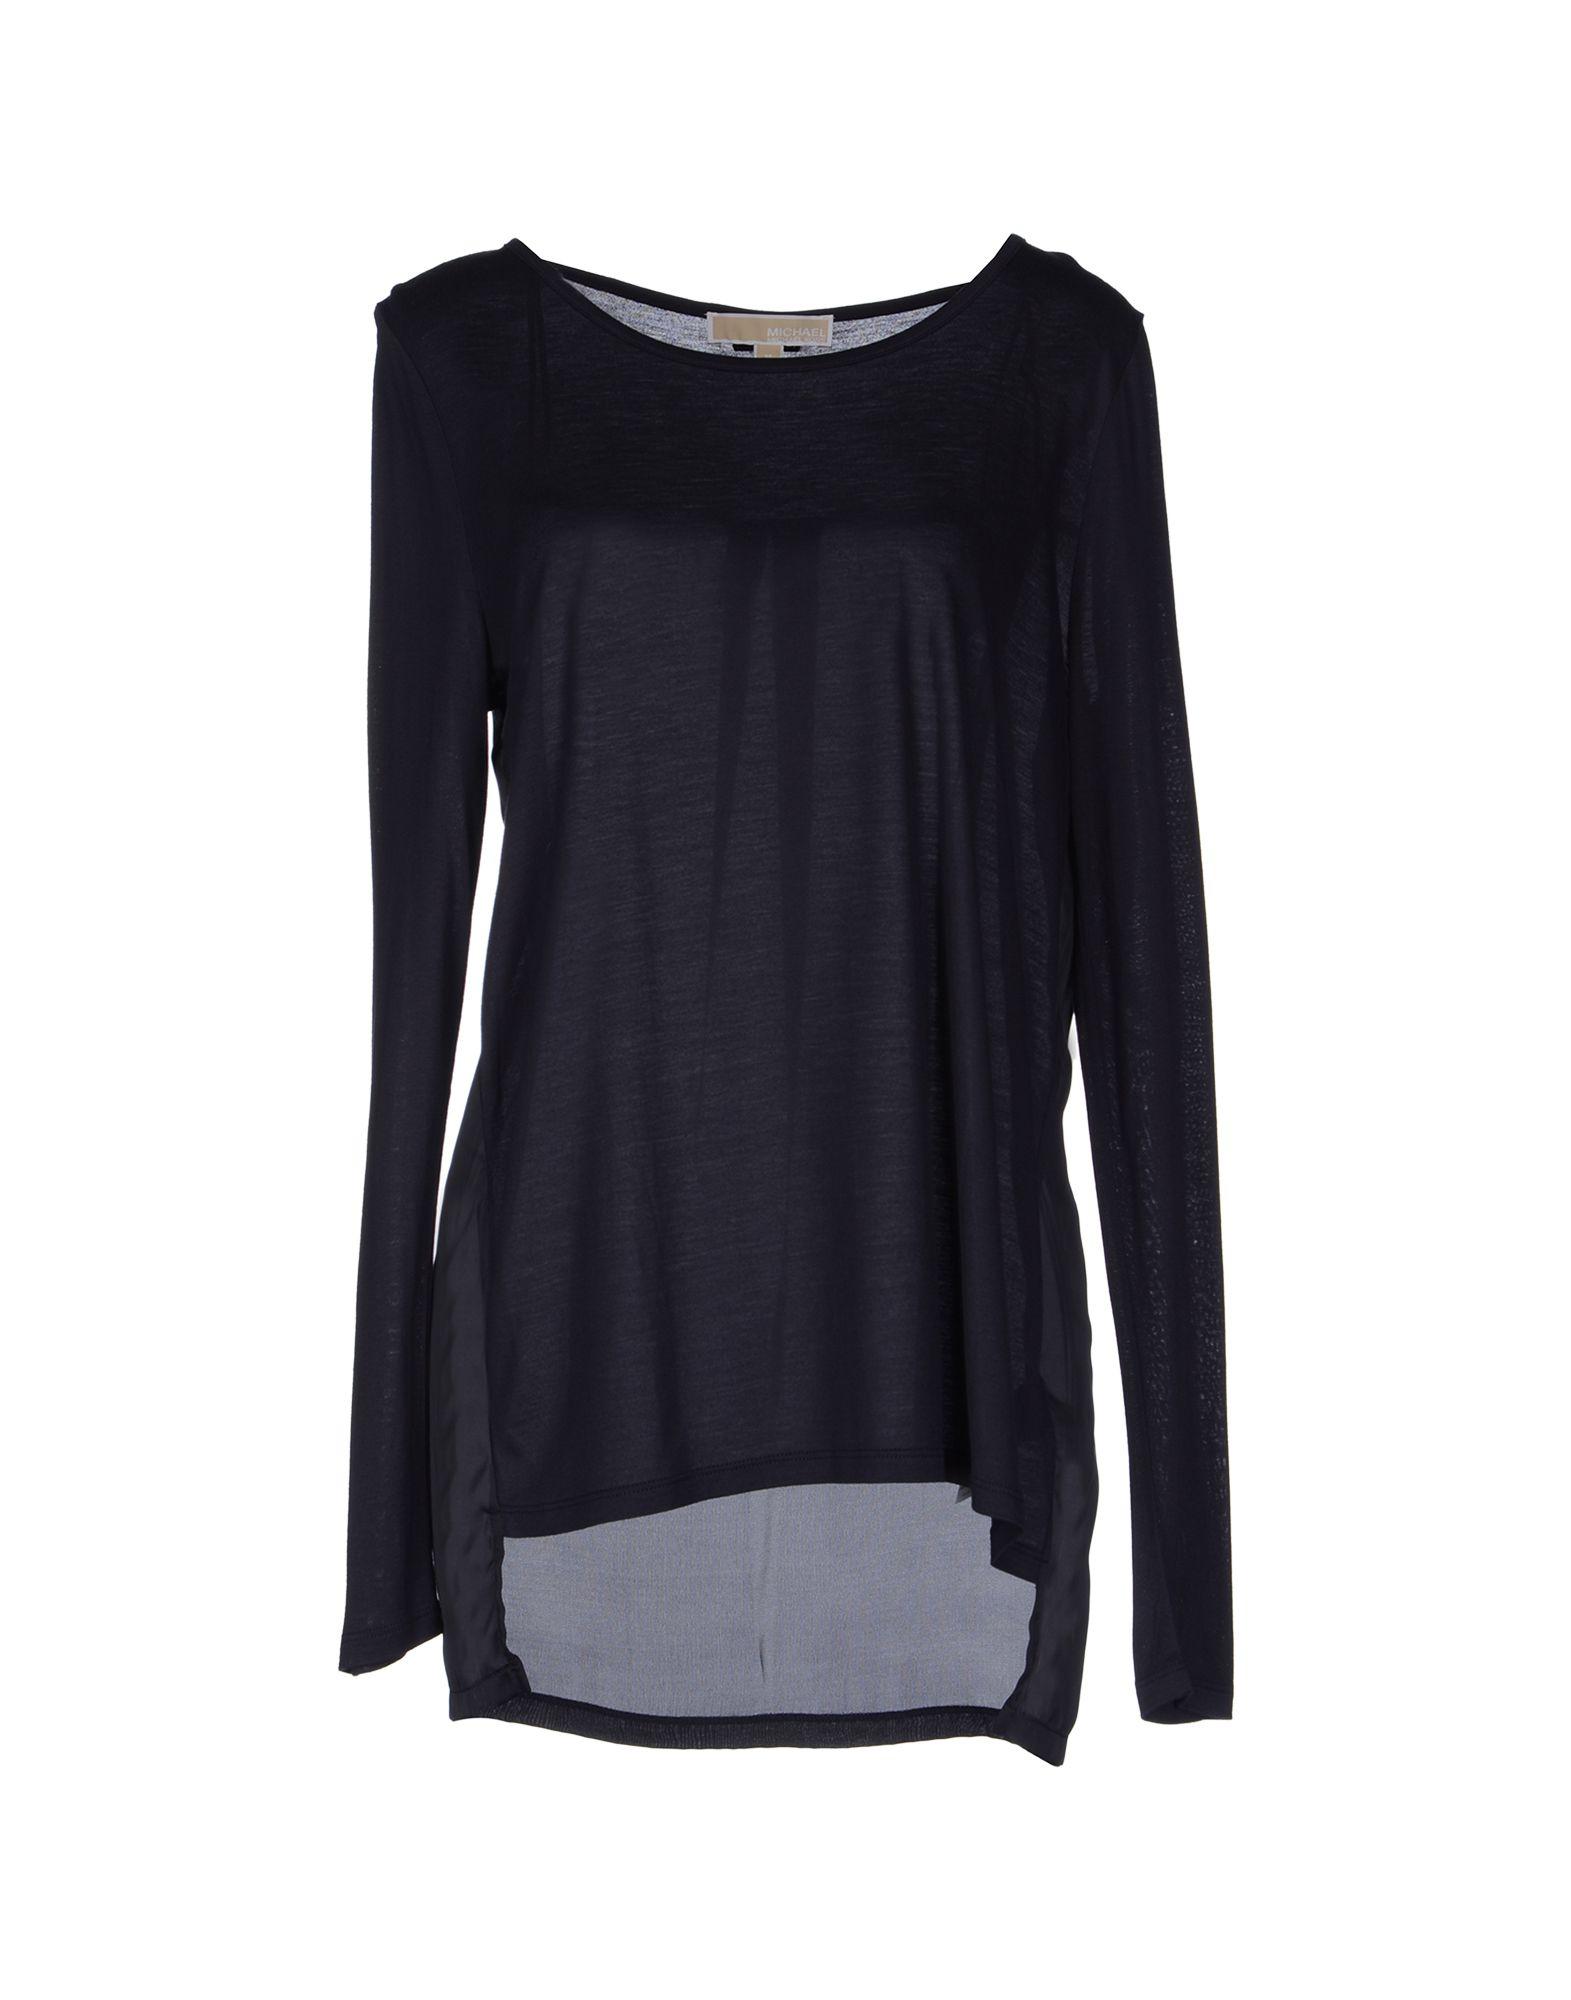 michael michael kors long sleeve tshirt in blue dark blue. Black Bedroom Furniture Sets. Home Design Ideas